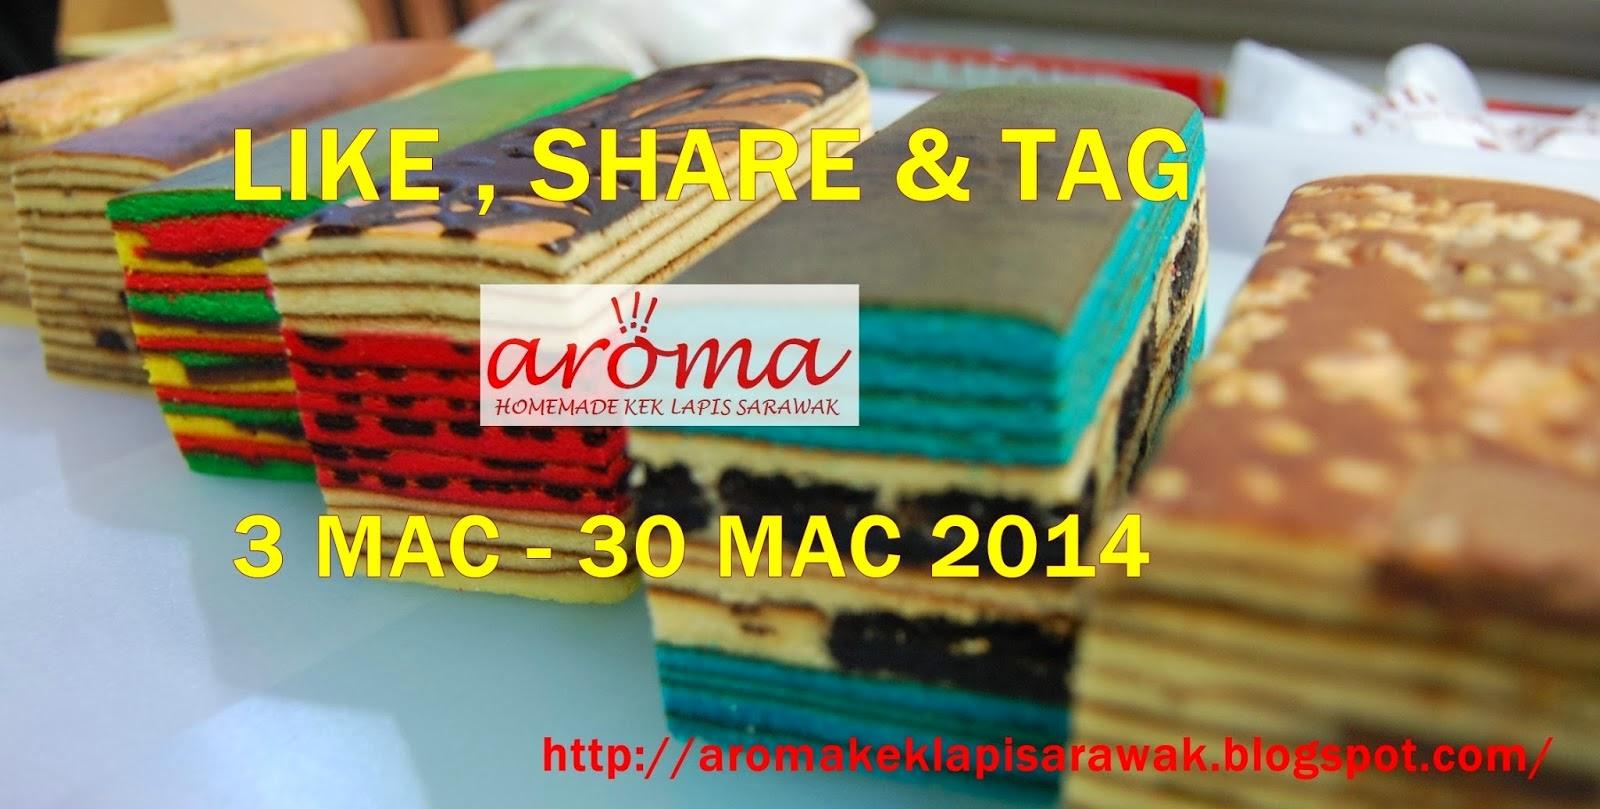 http://aromakeklapisarawak.blogspot.com/2014/03/aroma-kek-lapis-sarawak-1st-giveaway.html